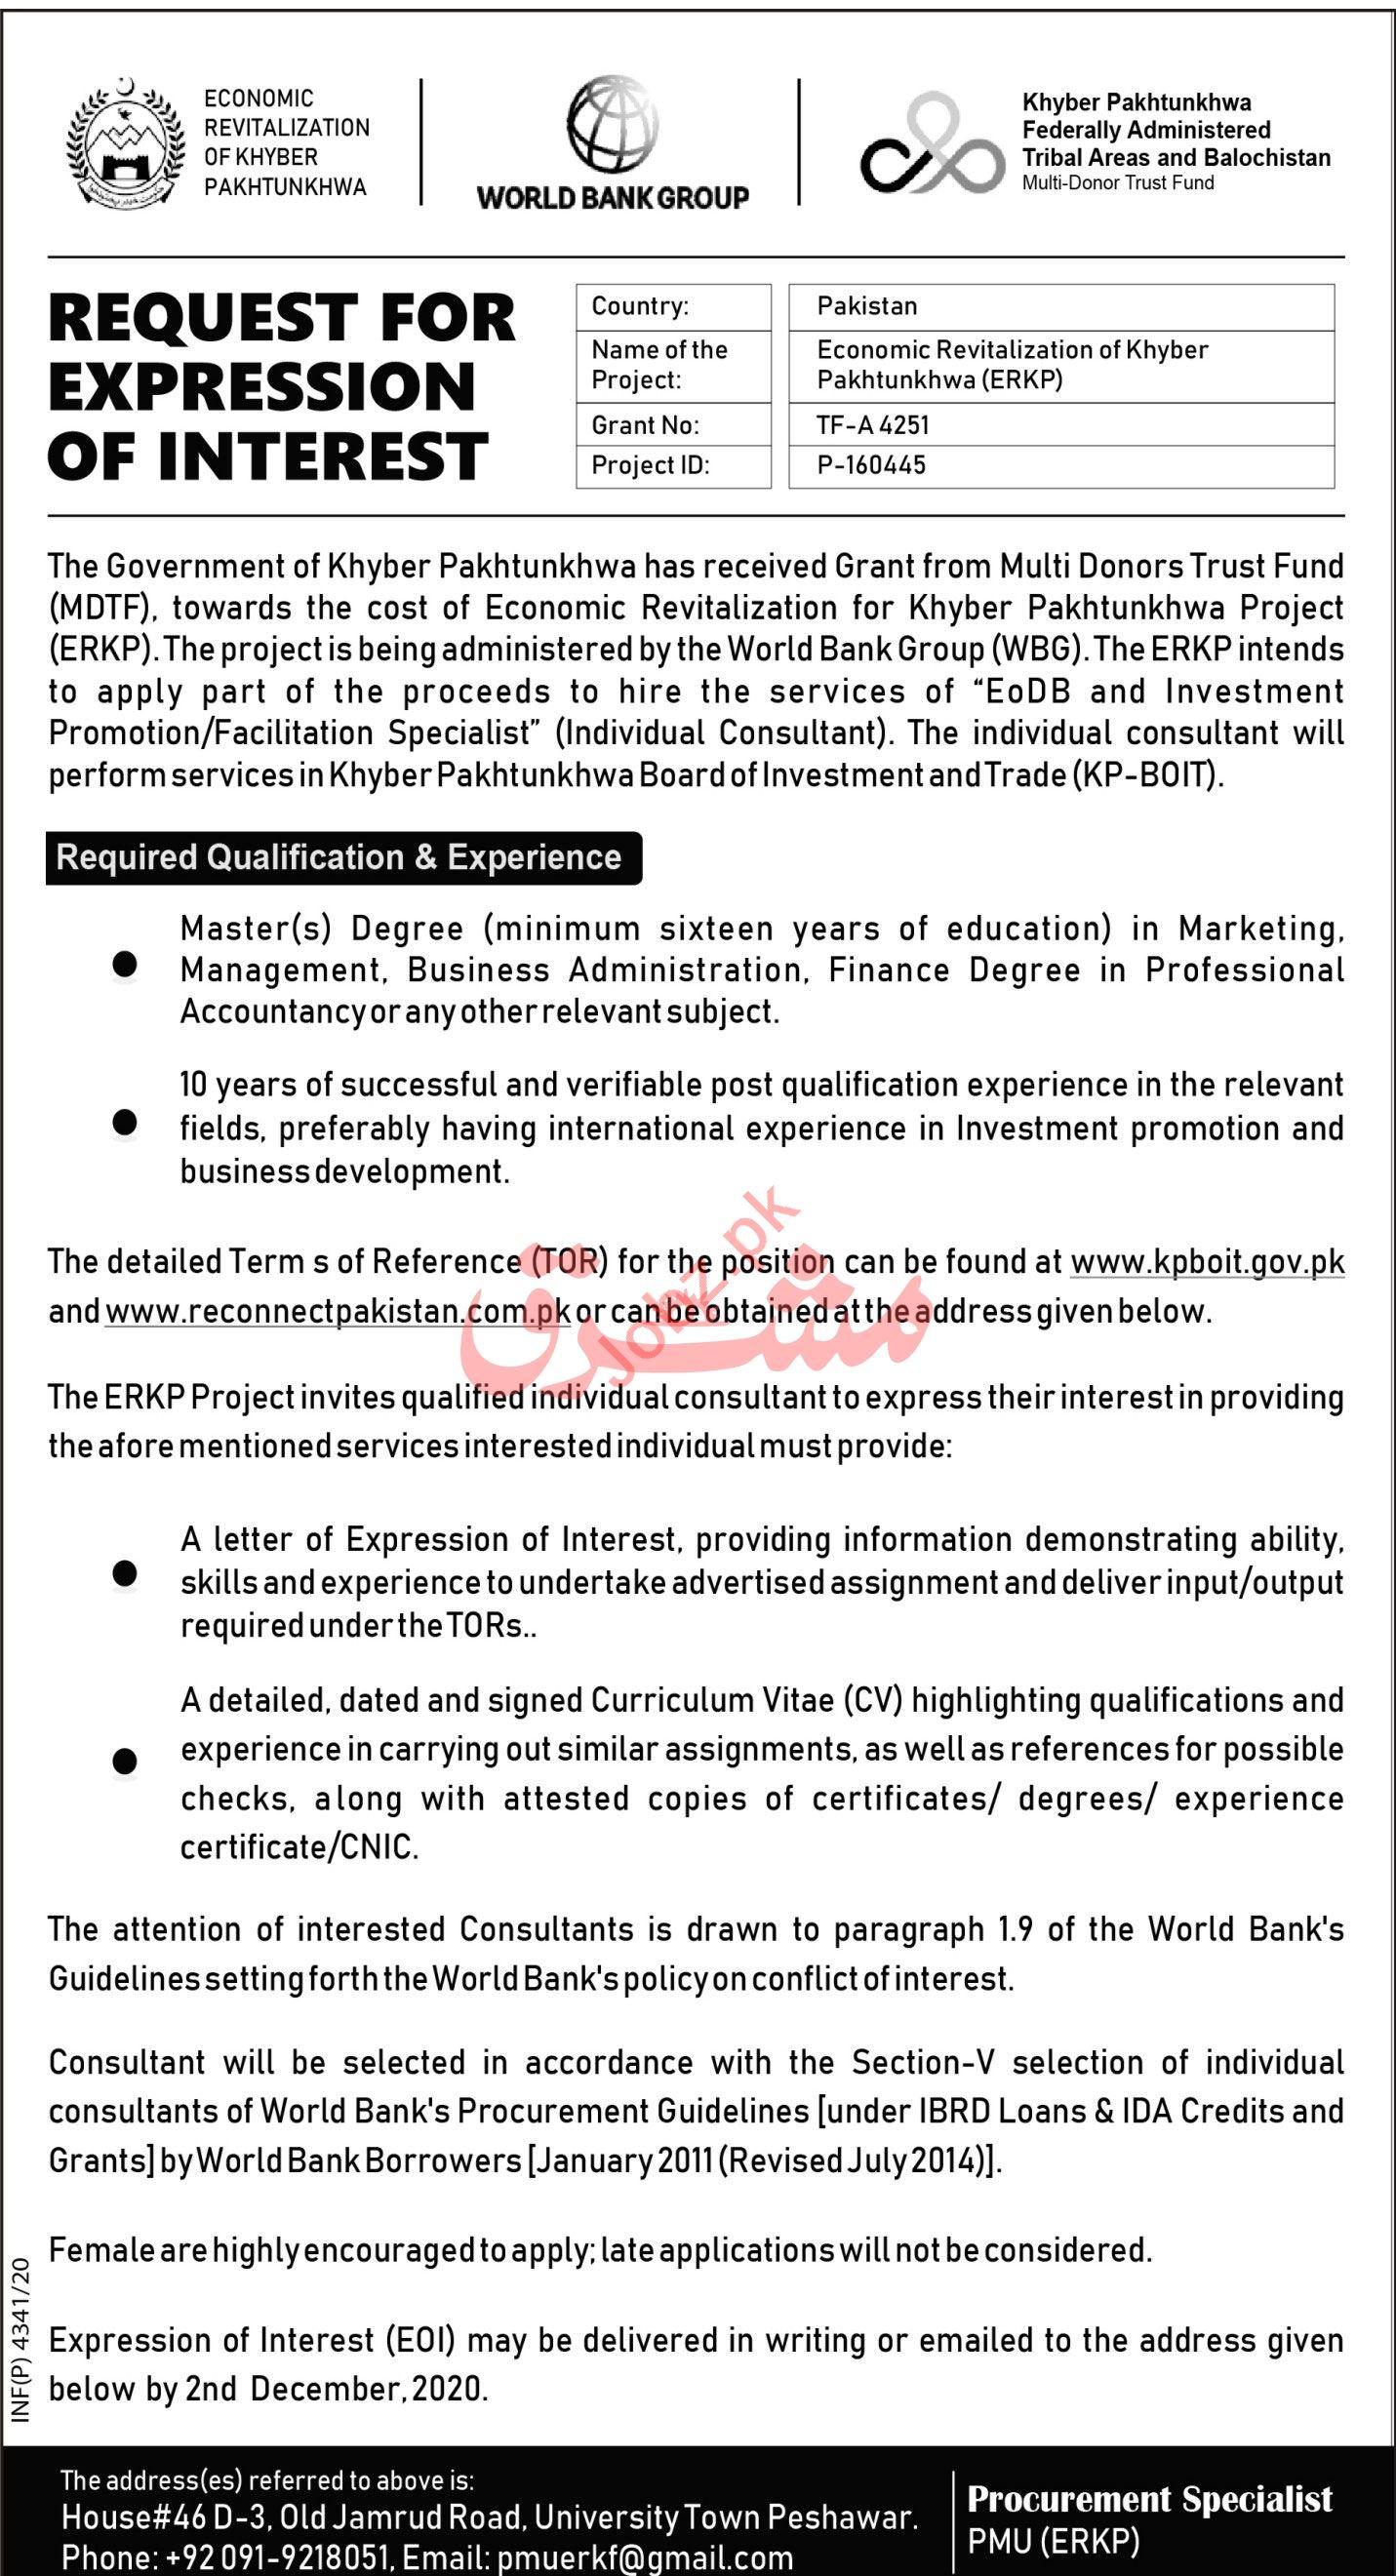 Economic Revitalization of Khyber Pakhtunkhwa ERKP Jobs 2020